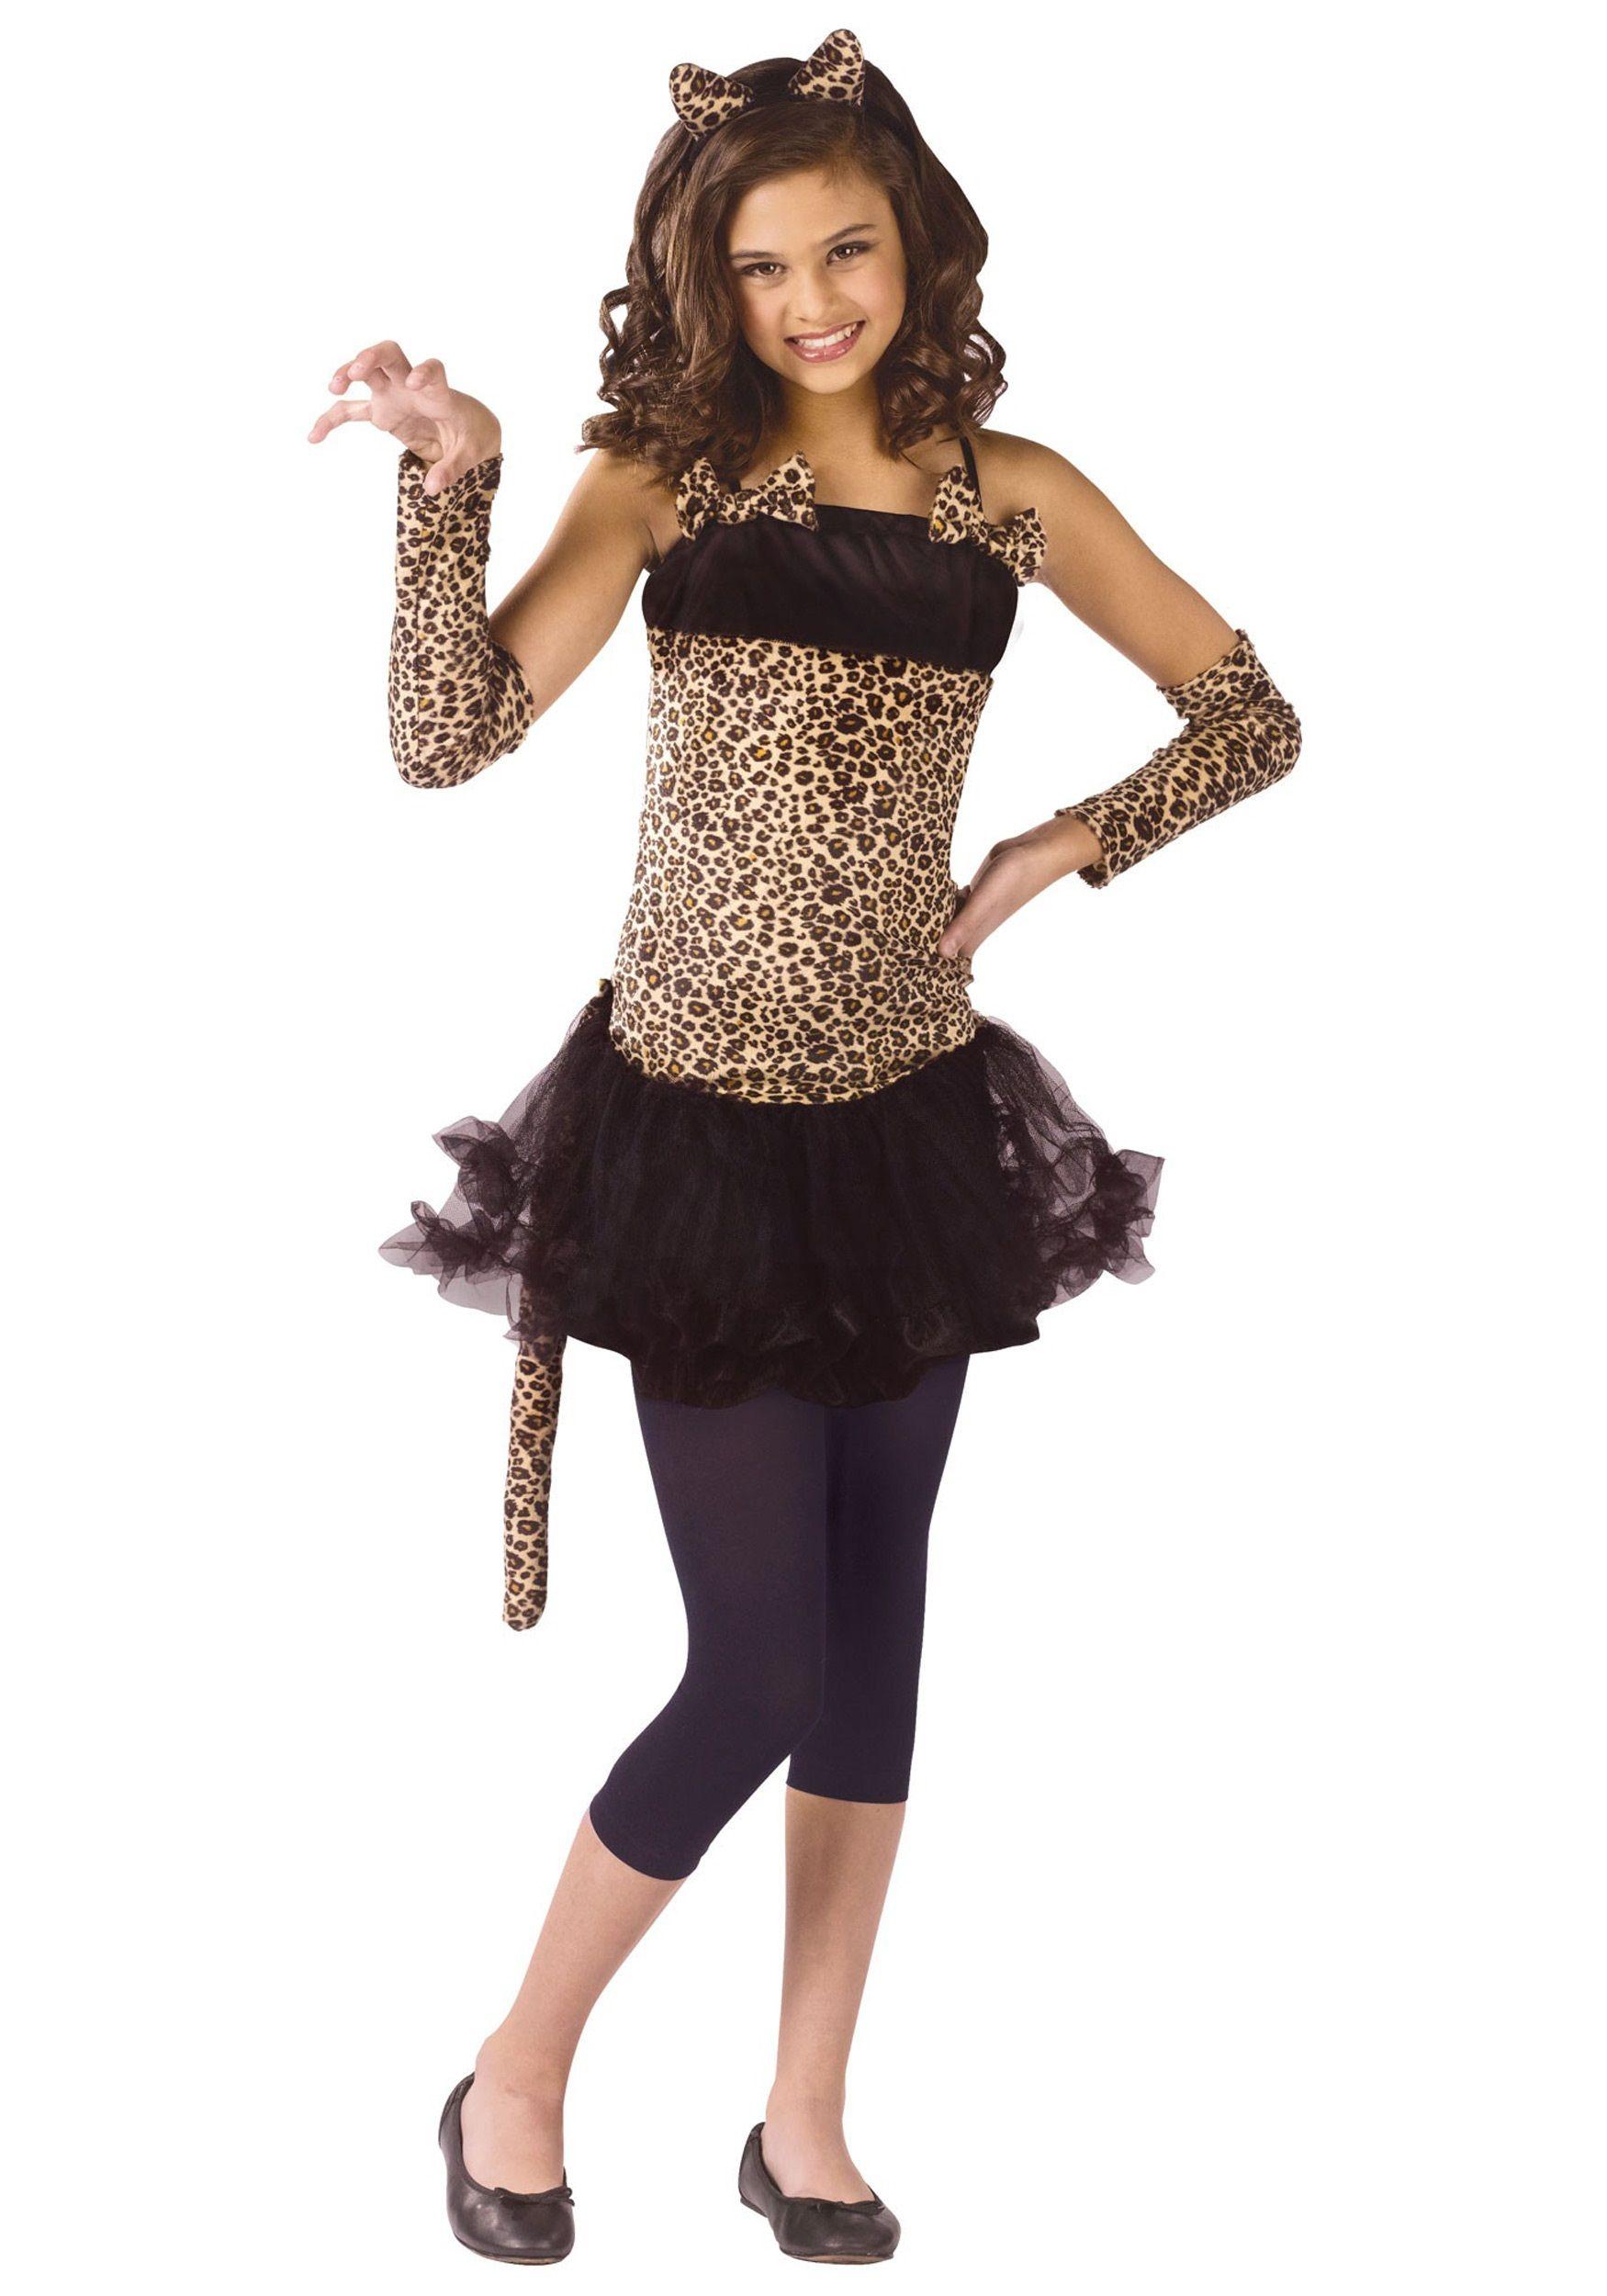 Girls Little Leopard Cat Catsuit Dress Halloween Child Costume Juniors C48129